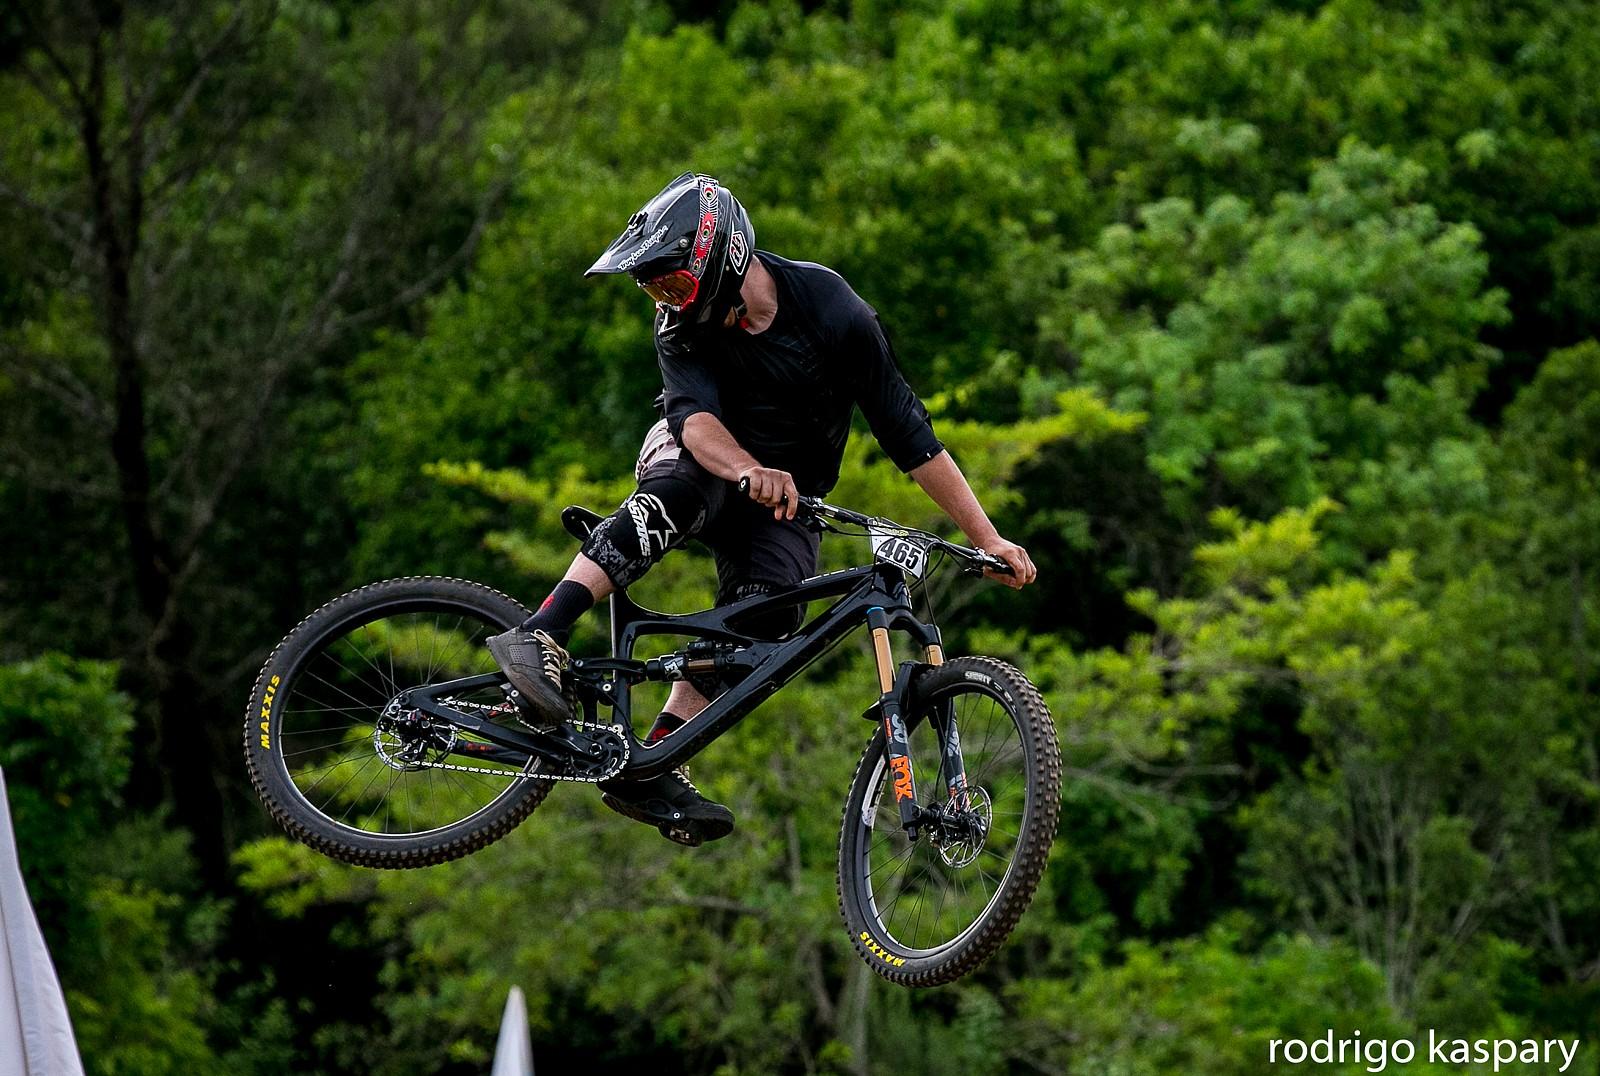 IMG 0929 - Brunokali - Mountain Biking Pictures - Vital MTB